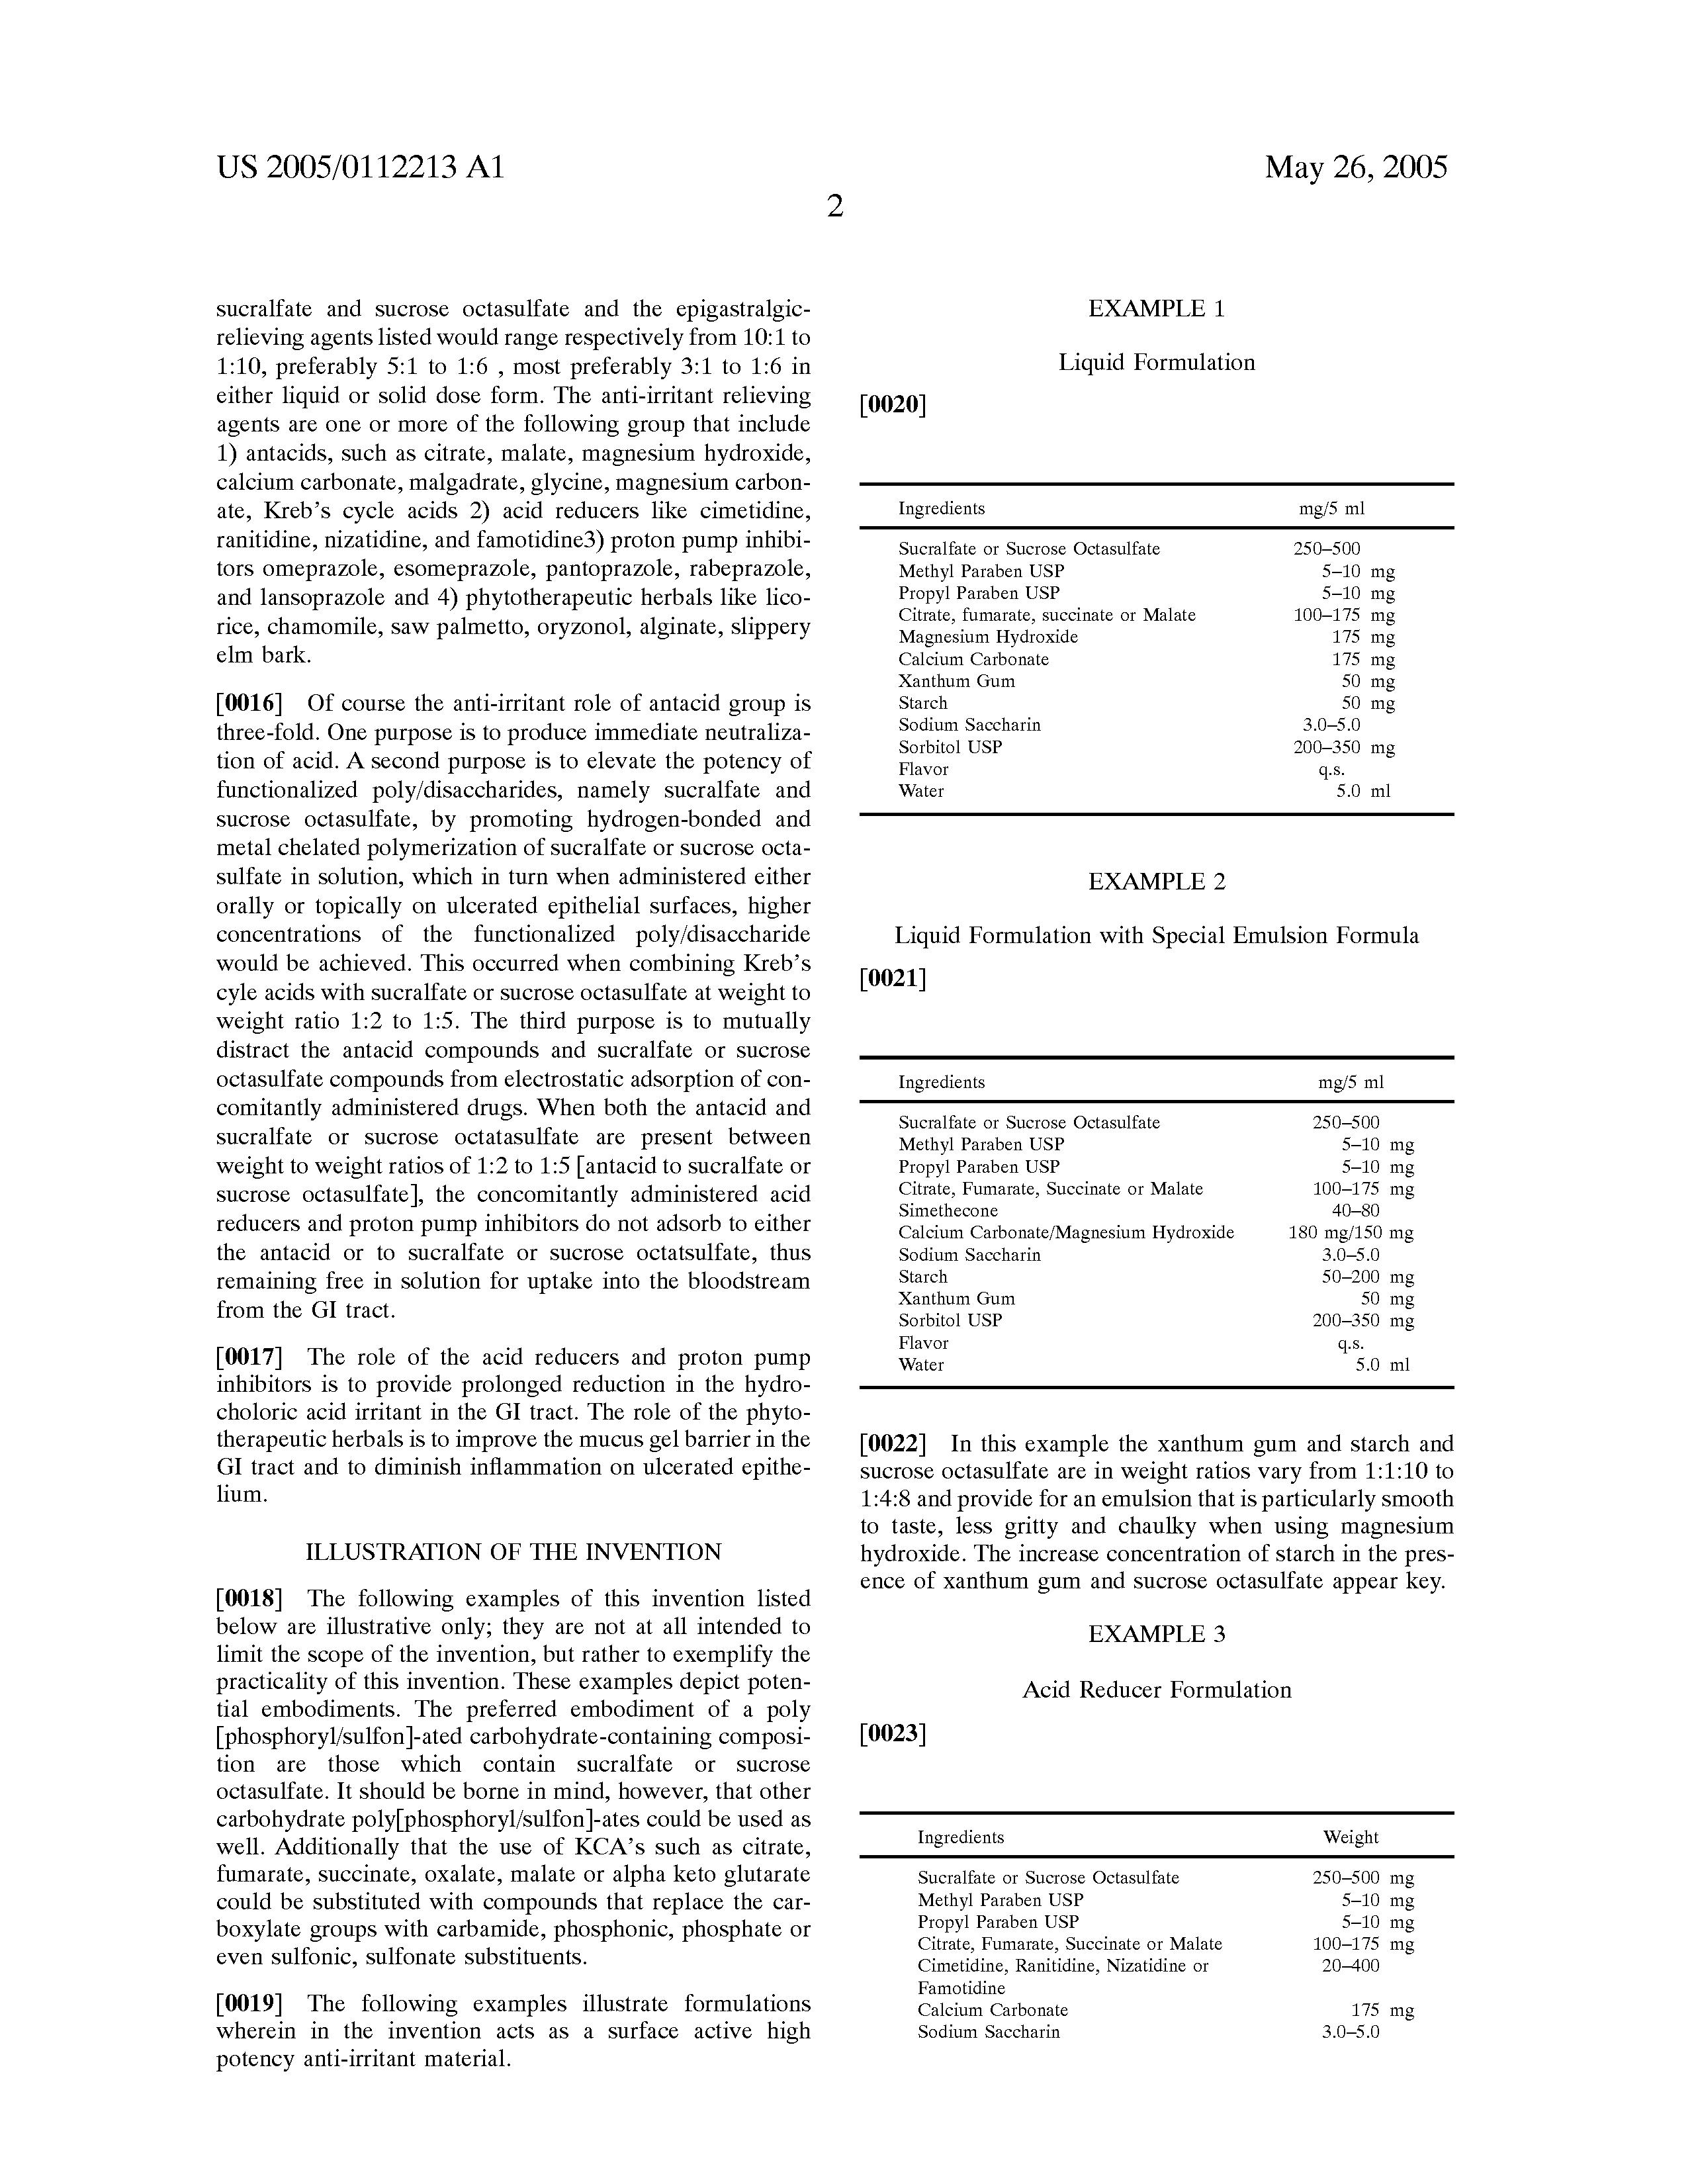 Naproxen 40 mg.doc - Patent Drawing